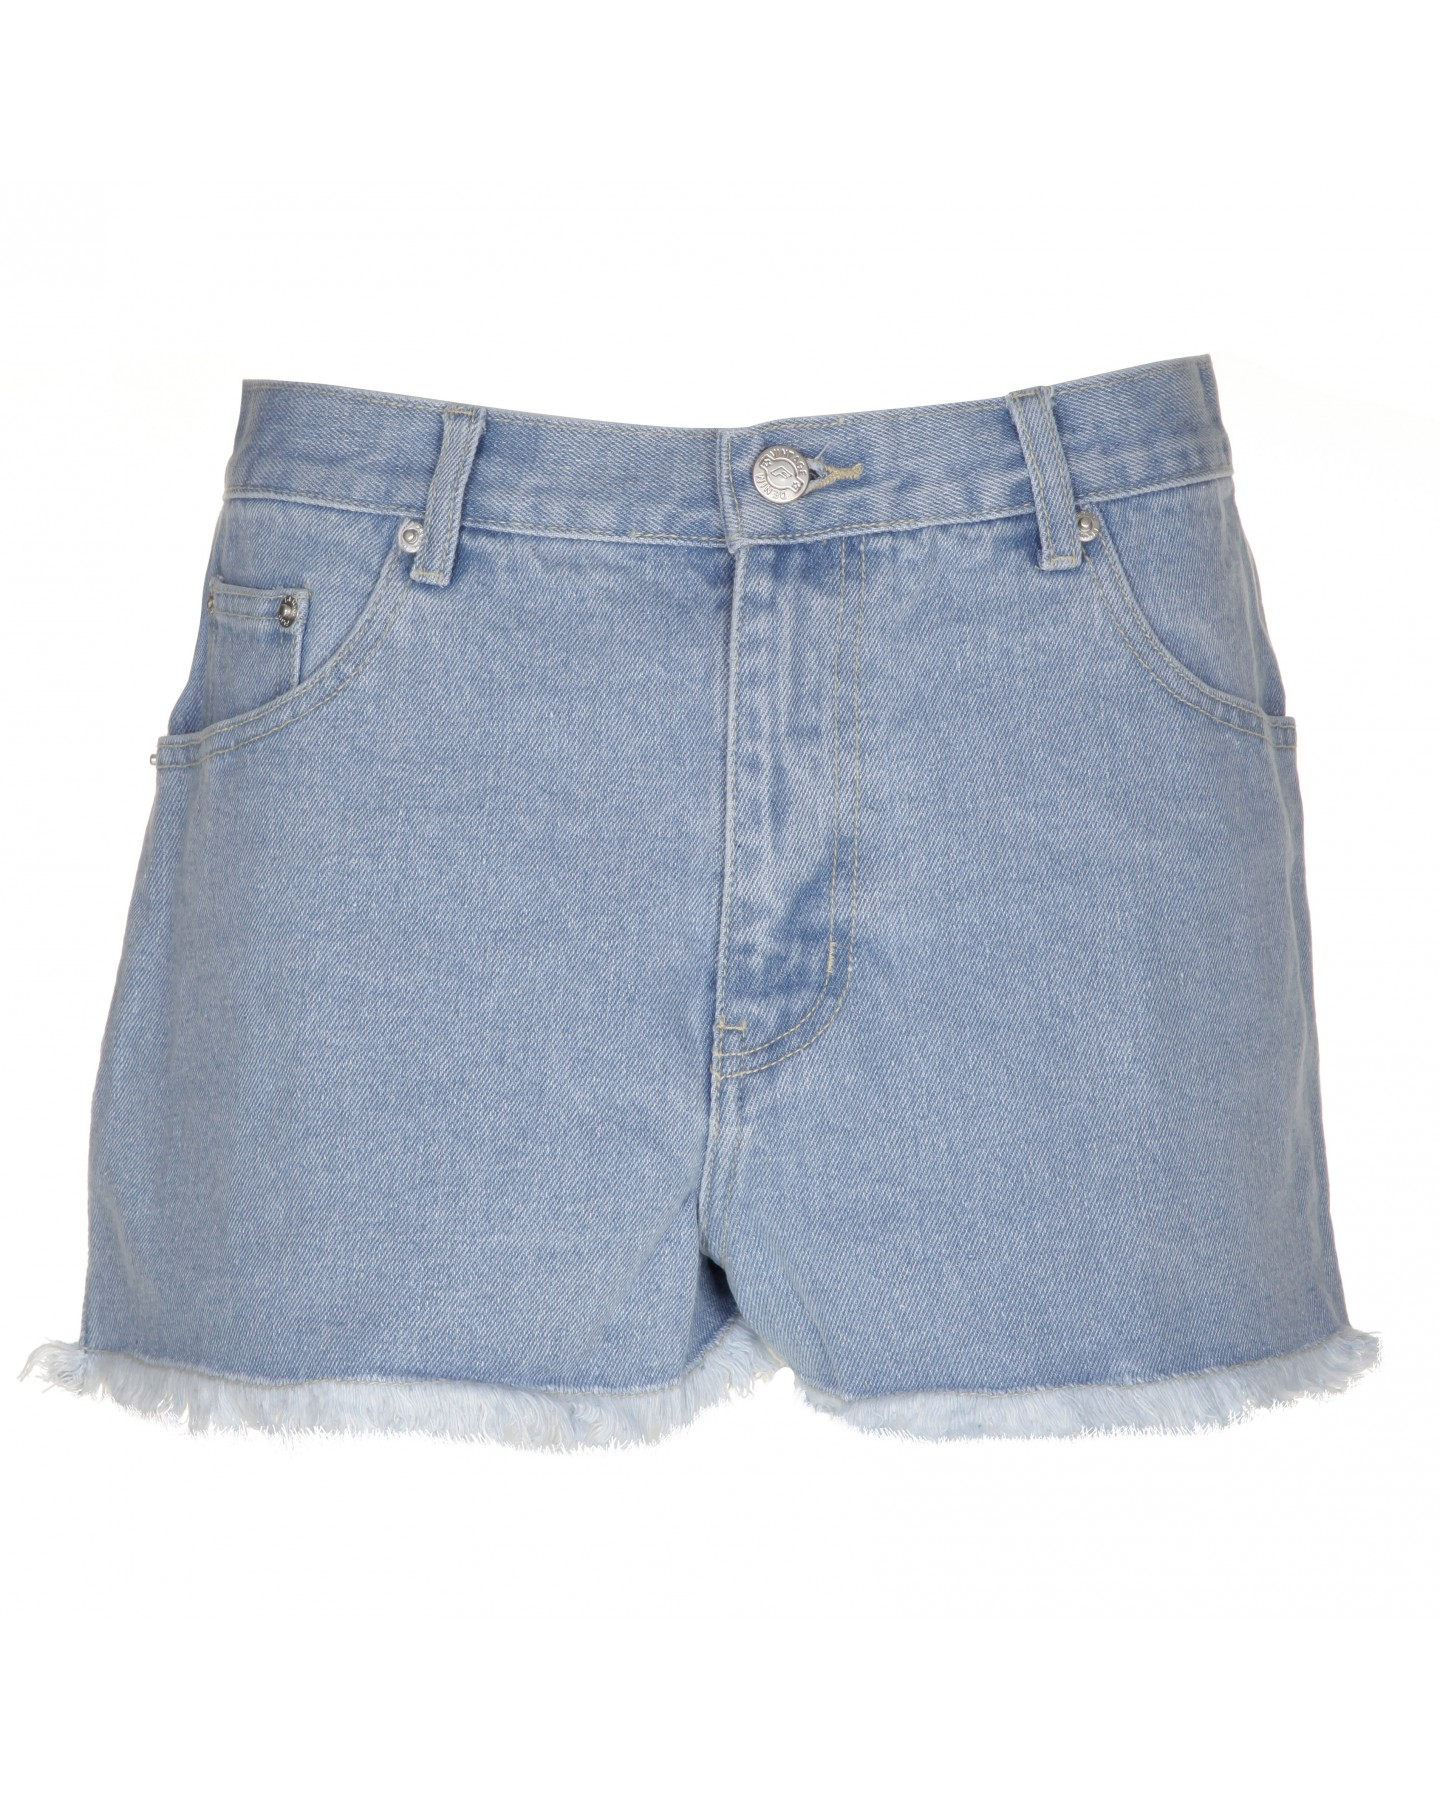 Blue-Inc-Womens-Frayed-Denim-Shorts-Light-Wash